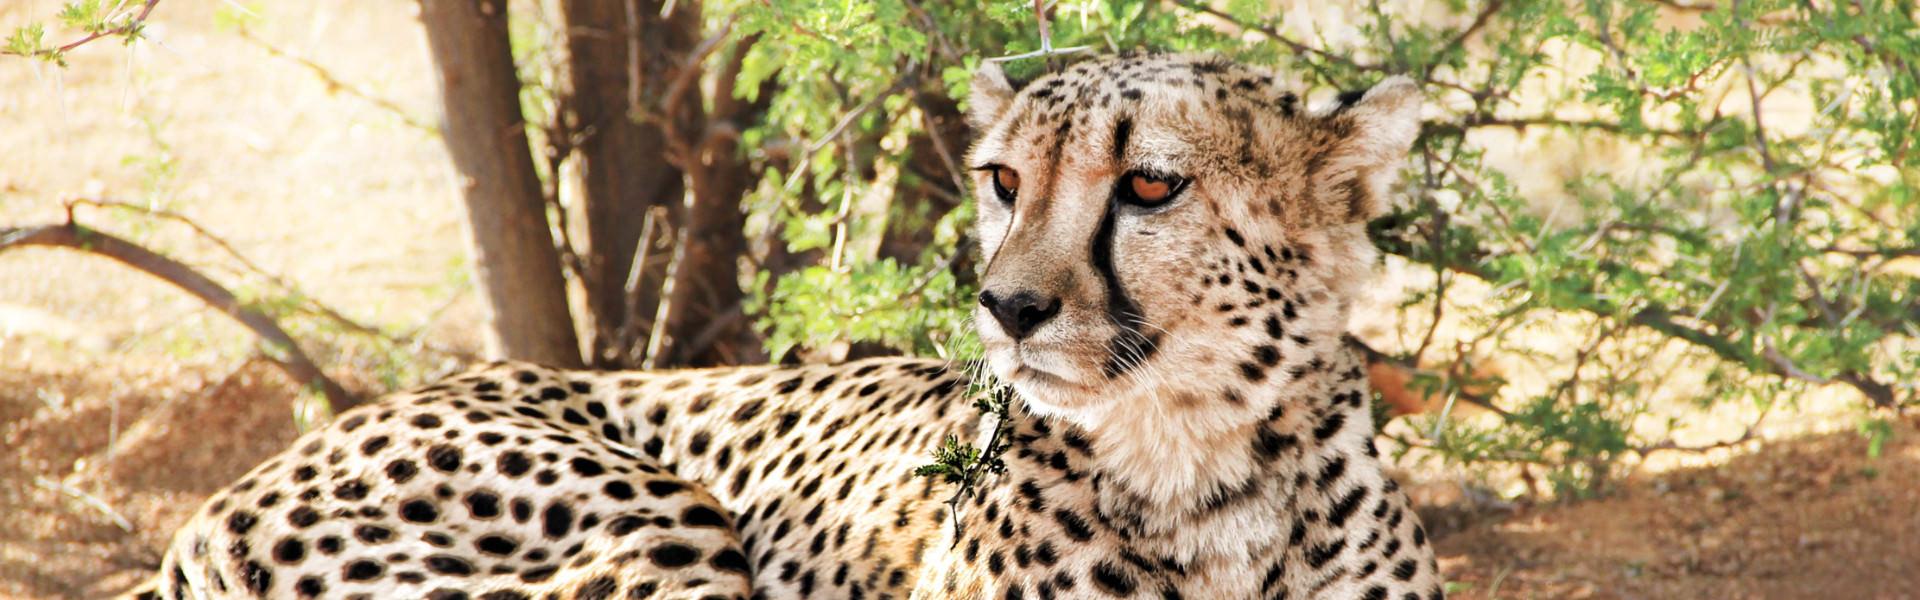 Mietwagenreisen Namibia - Tier-Reisen